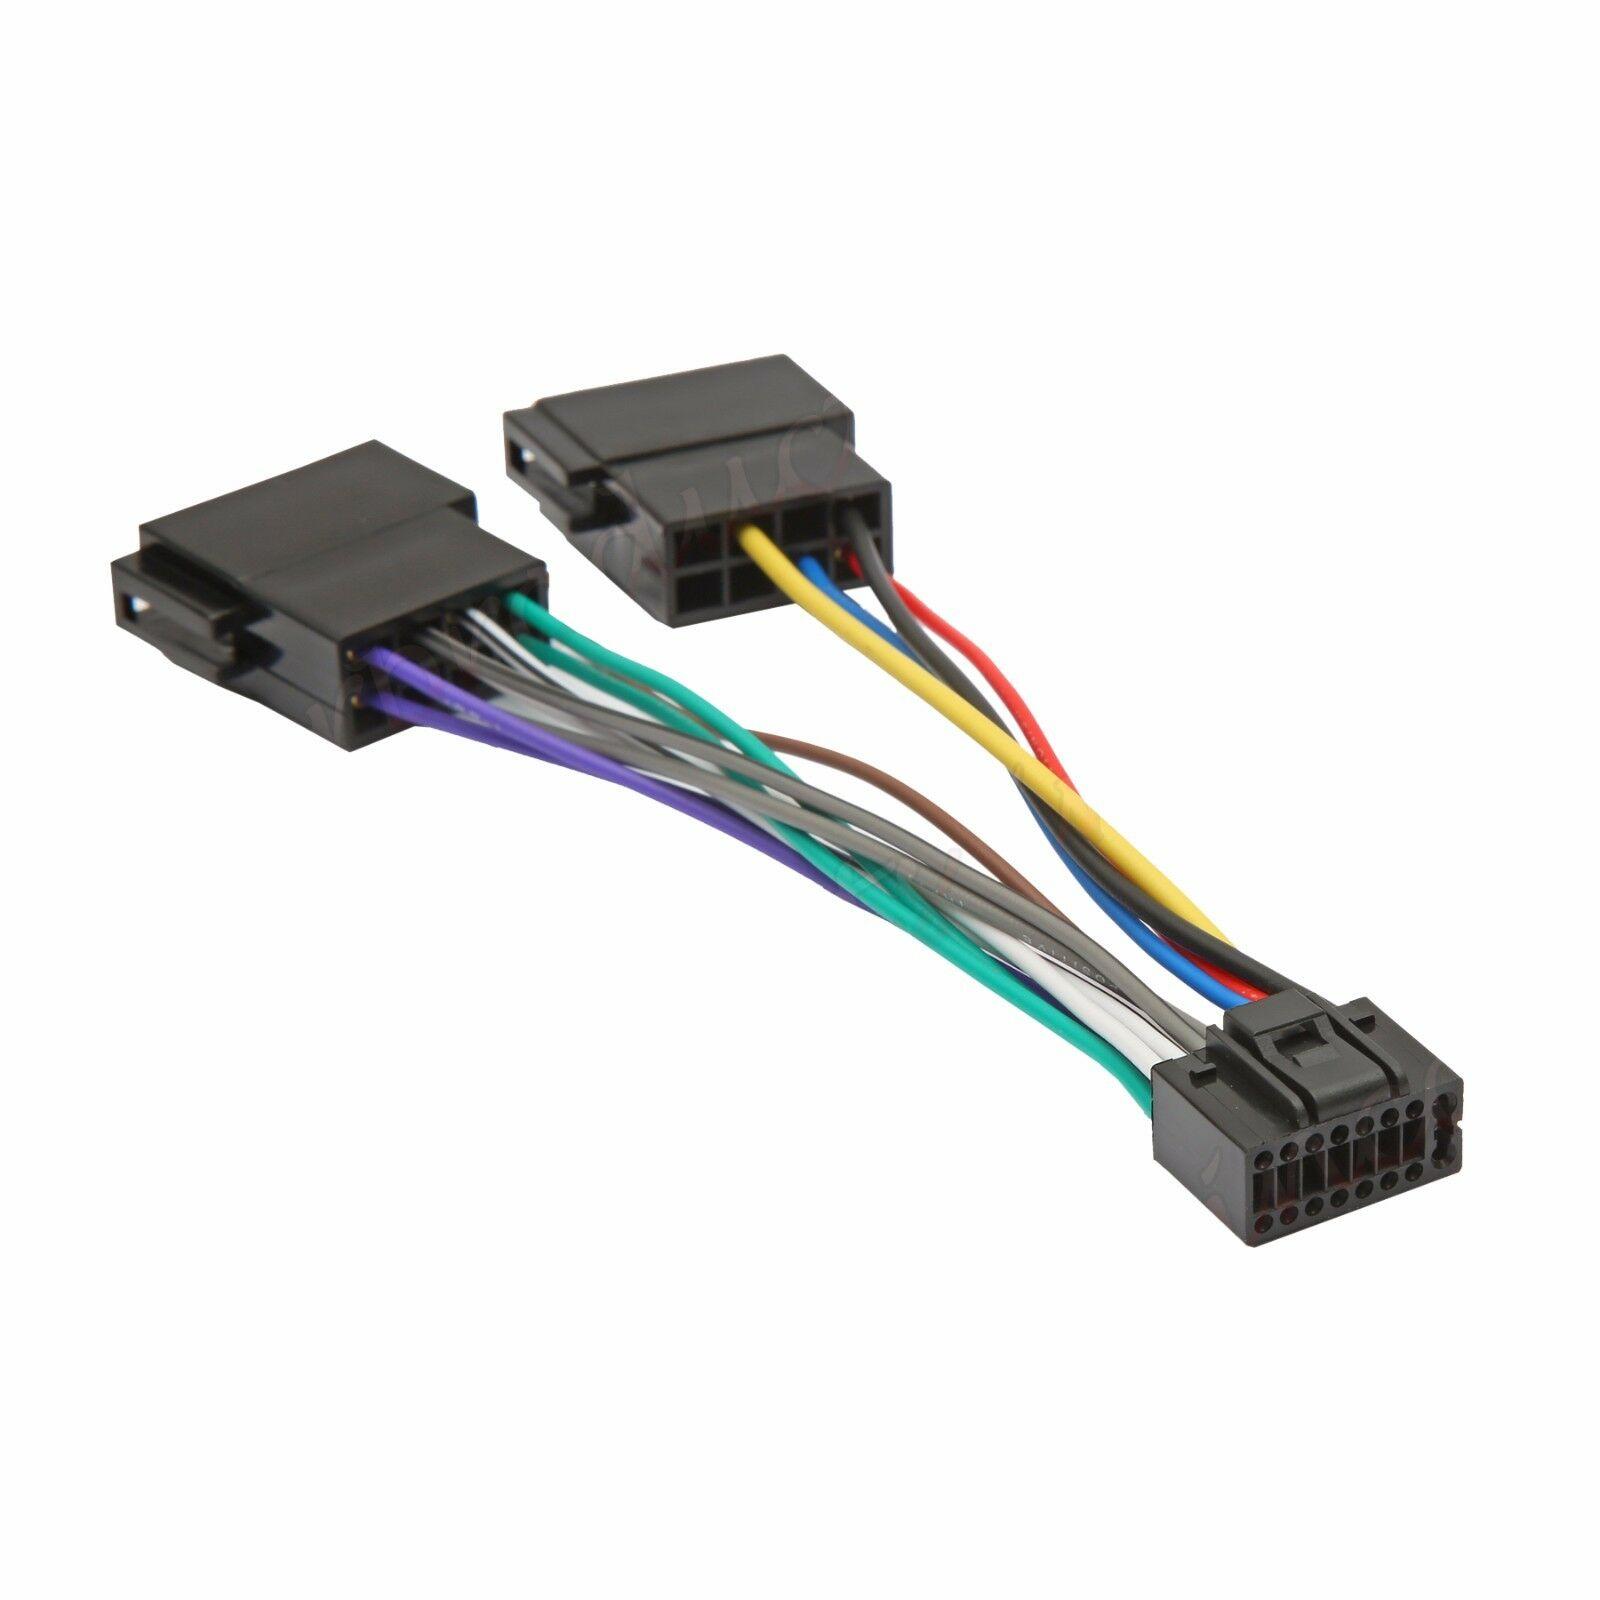 Superb Kenwood Jvc 16 Pin Iso Wiring Harness Connector Adaptor Car Stereo Wiring Cloud Lukepaidewilluminateatxorg